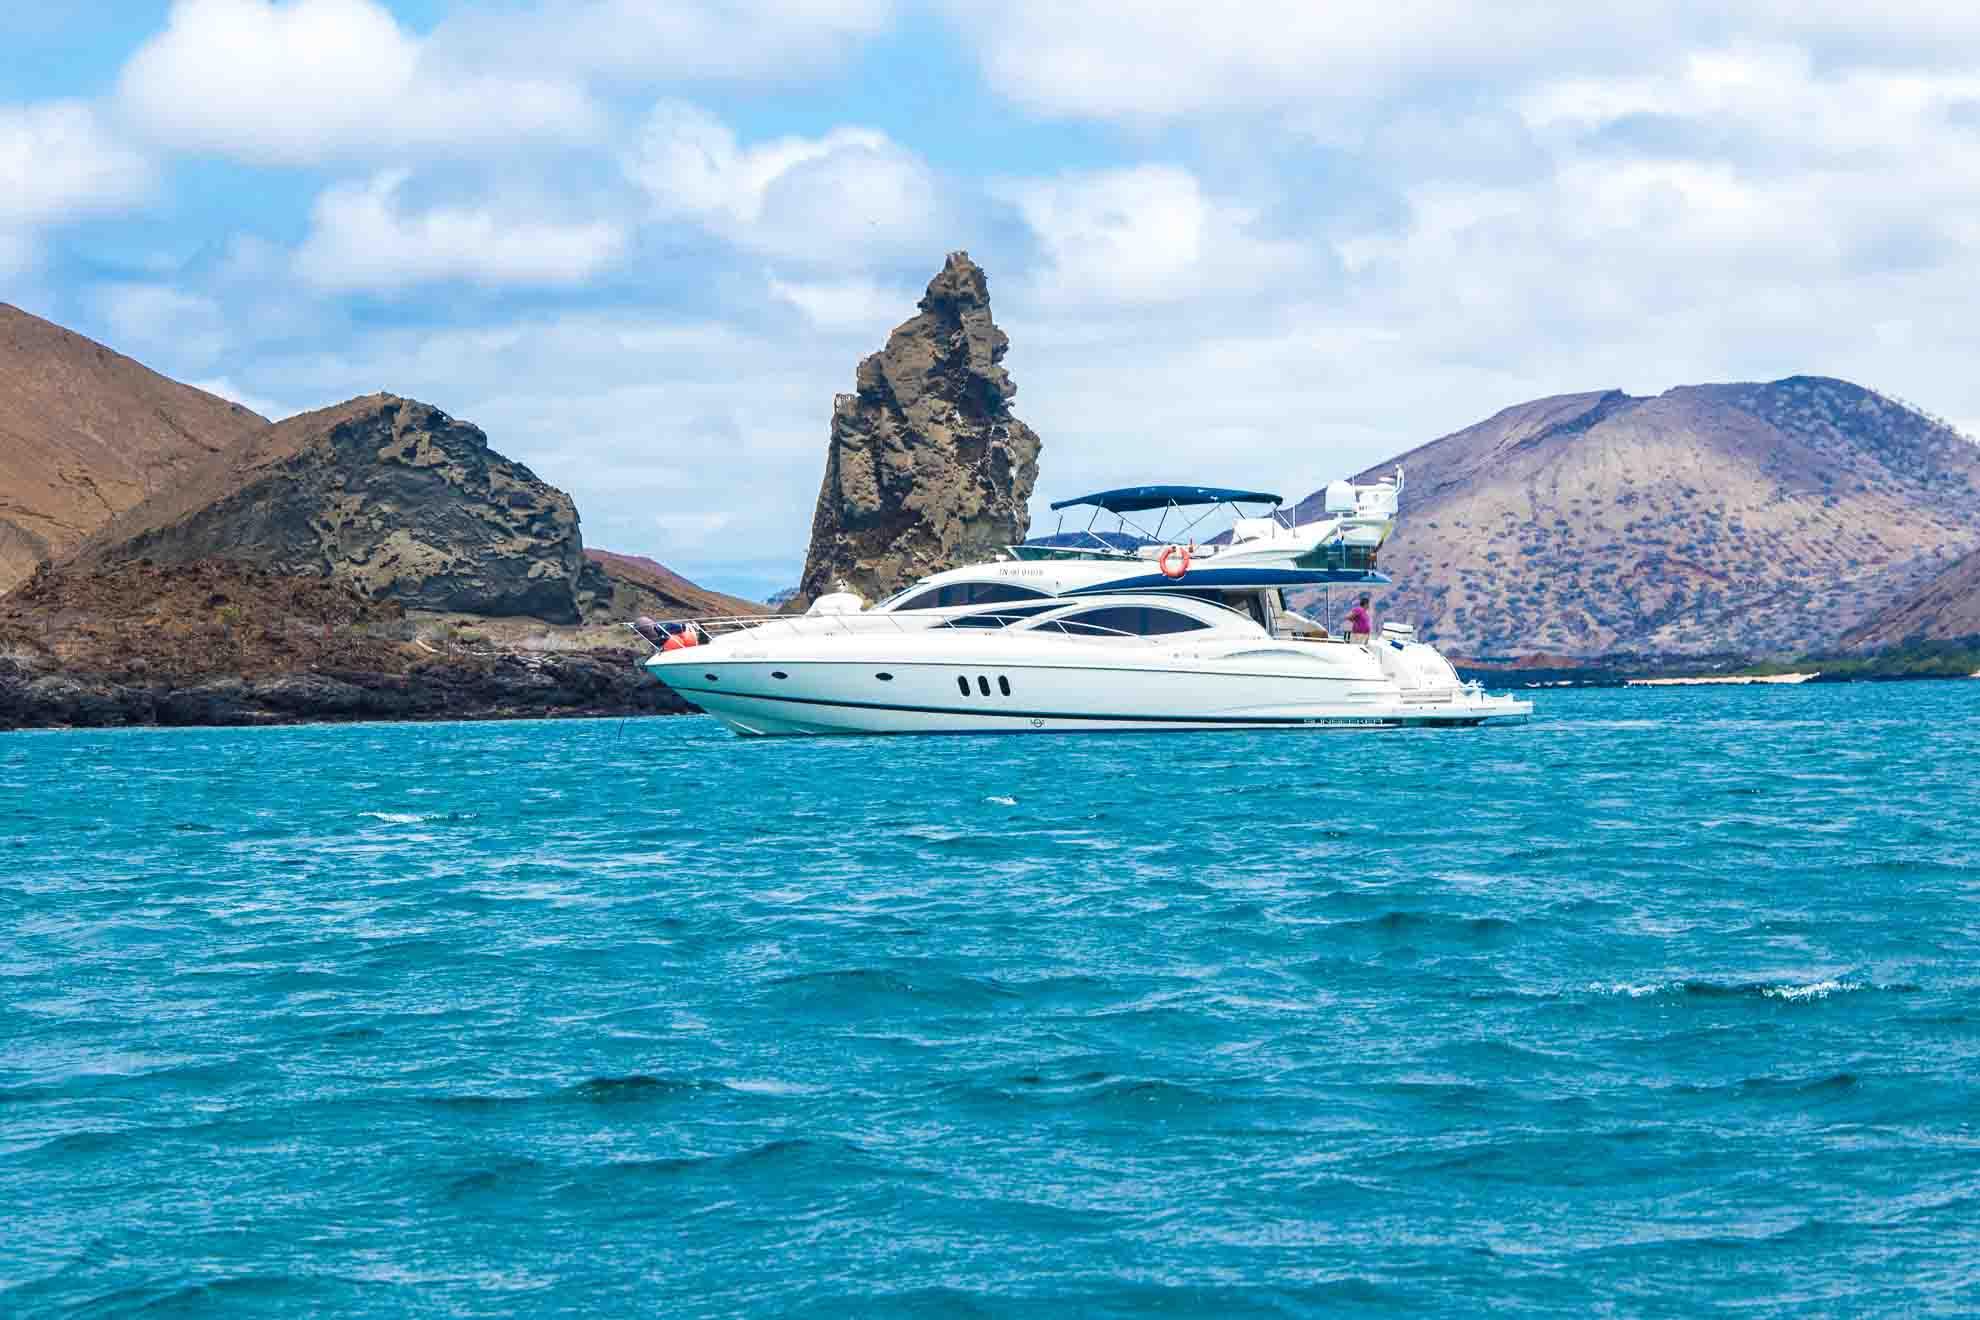 Galapagos yacht | Kicker rock